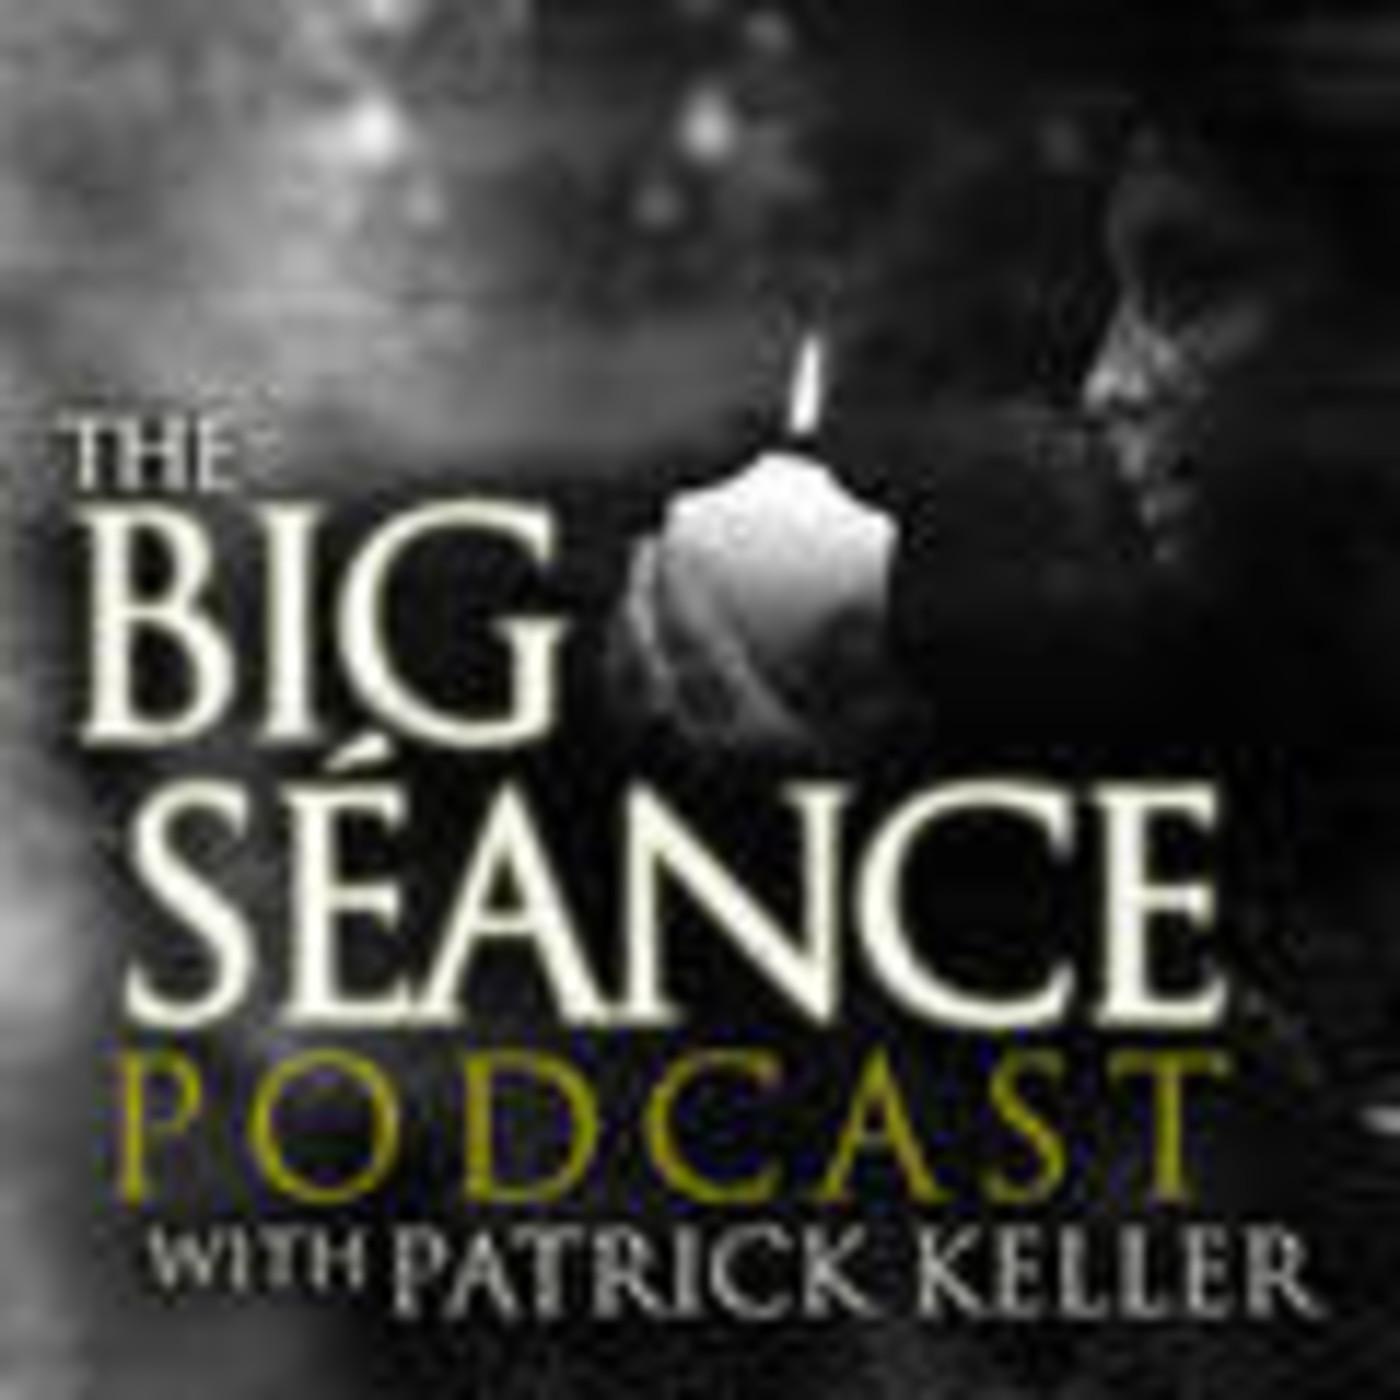 Patrick Keller | BigSeance.com